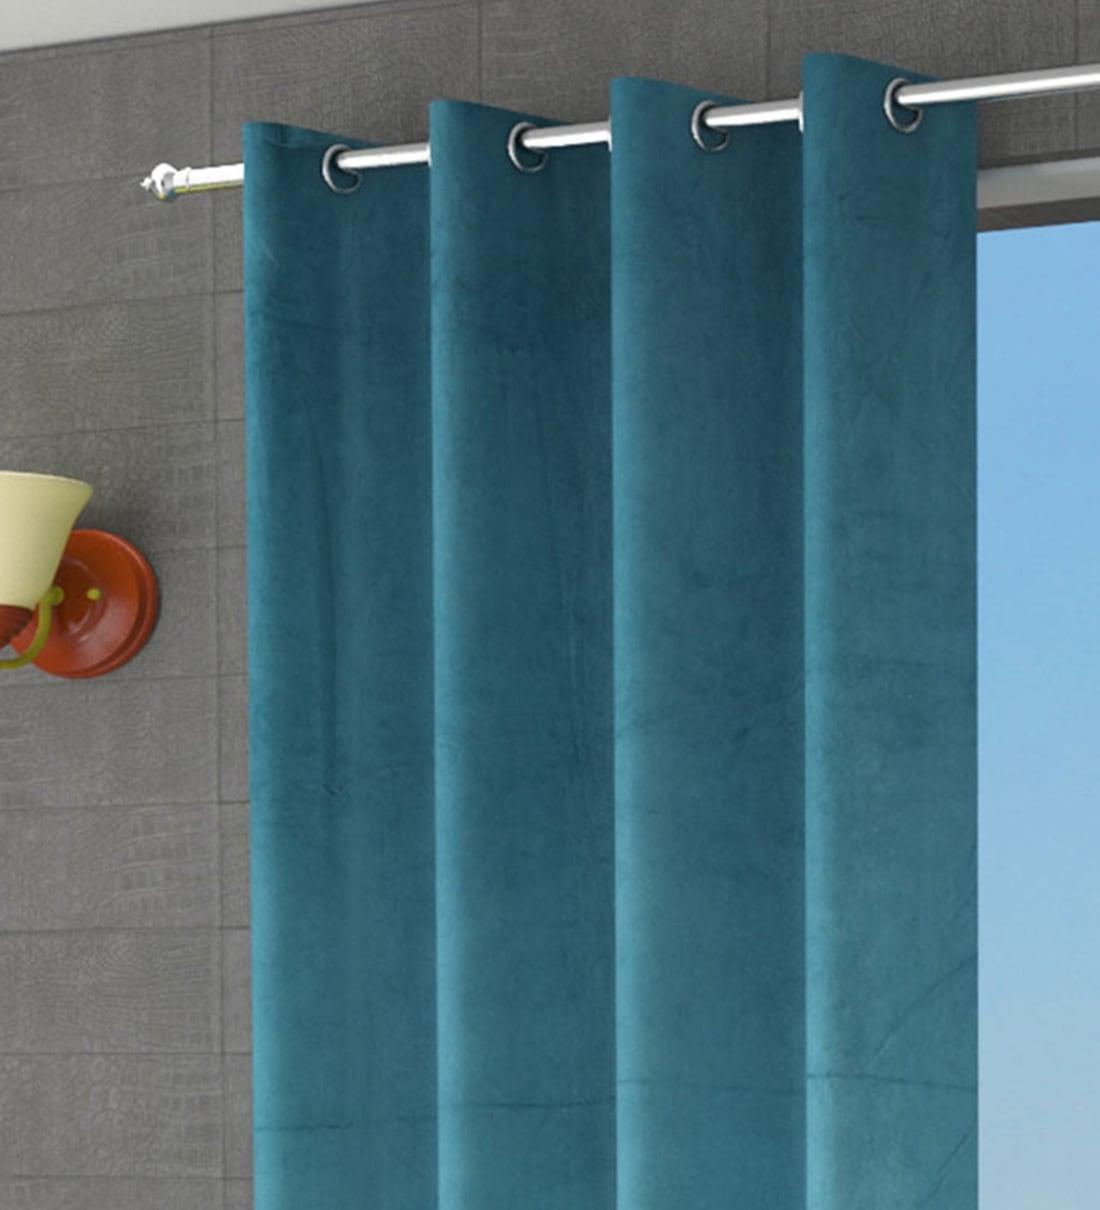 Buy Blue Semisheer Velvet 9 Feet Eyelet Long Door Curtains Set Of 2 By Home Attire Online Solid Colour Curtains And Drapes Curtains And Drapes Furnishings Pepperfry Product